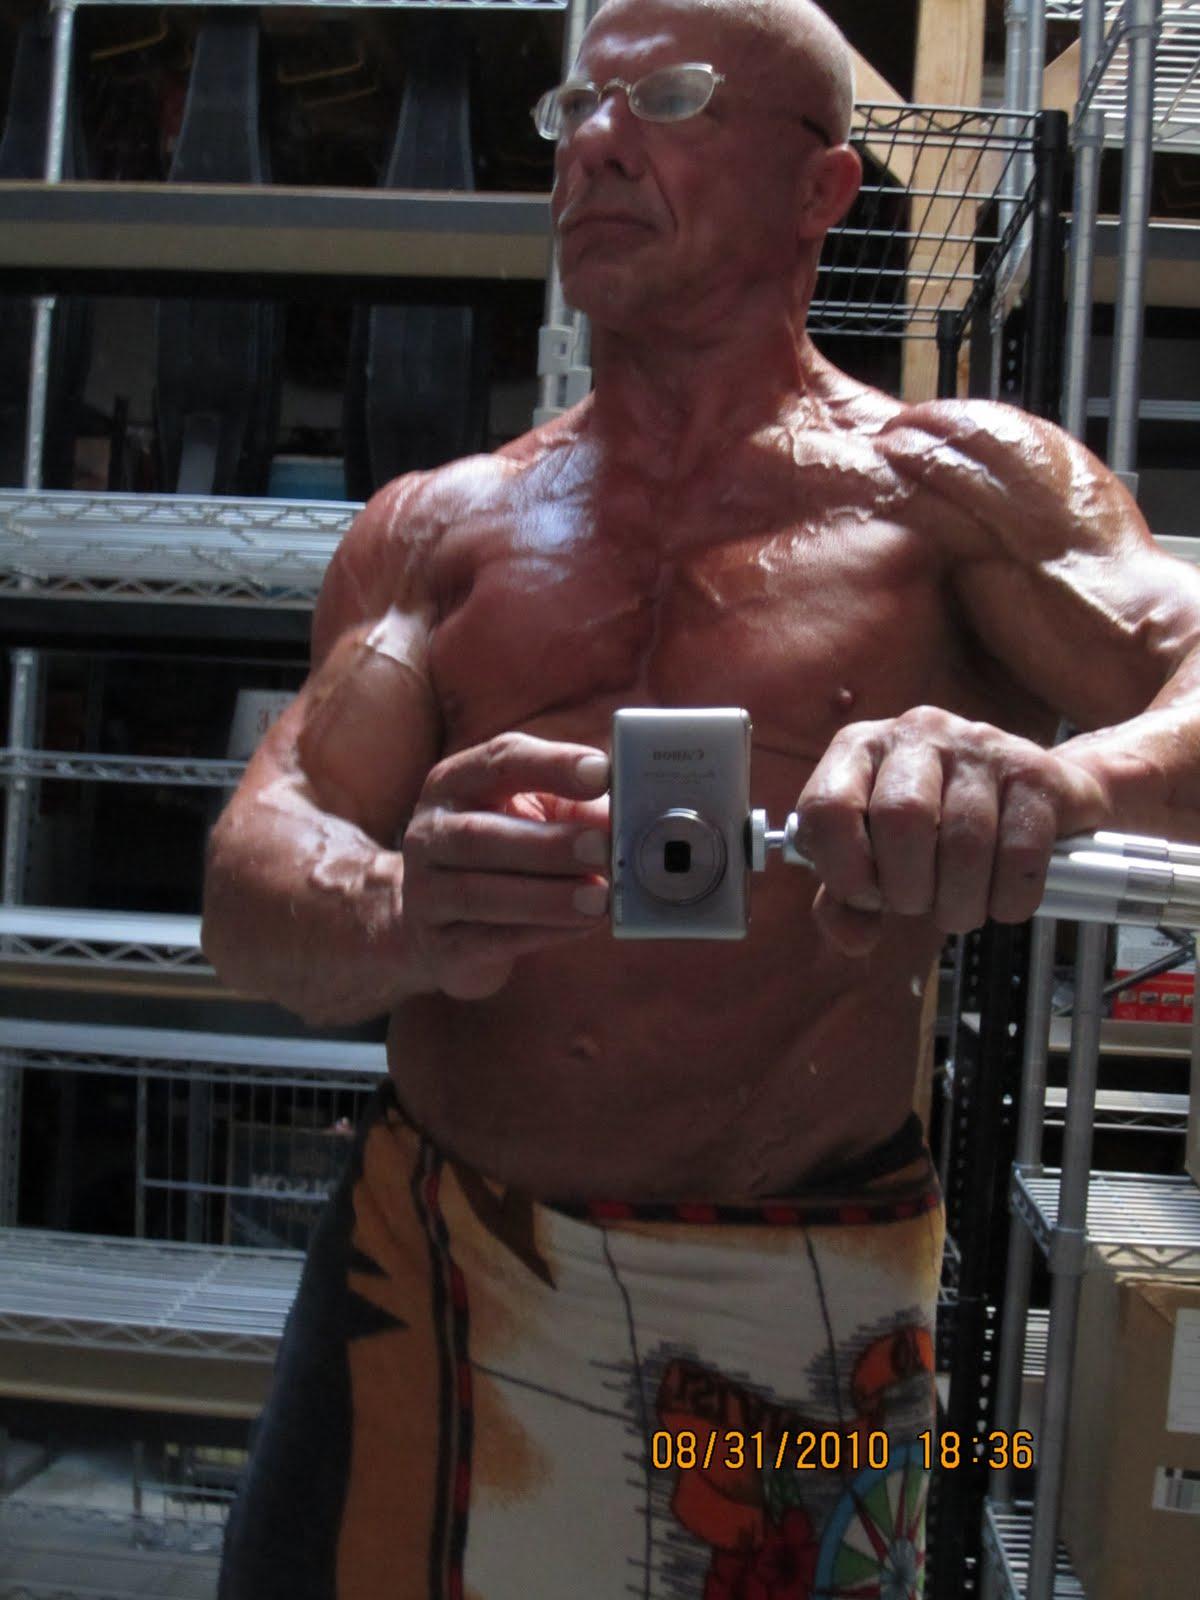 http://2.bp.blogspot.com/_W1HsDawS3TY/TIWHiV7lgbI/AAAAAAAAMzw/dmR53BCImnY/s1600/A+C+Extreme+shoulder.JPG